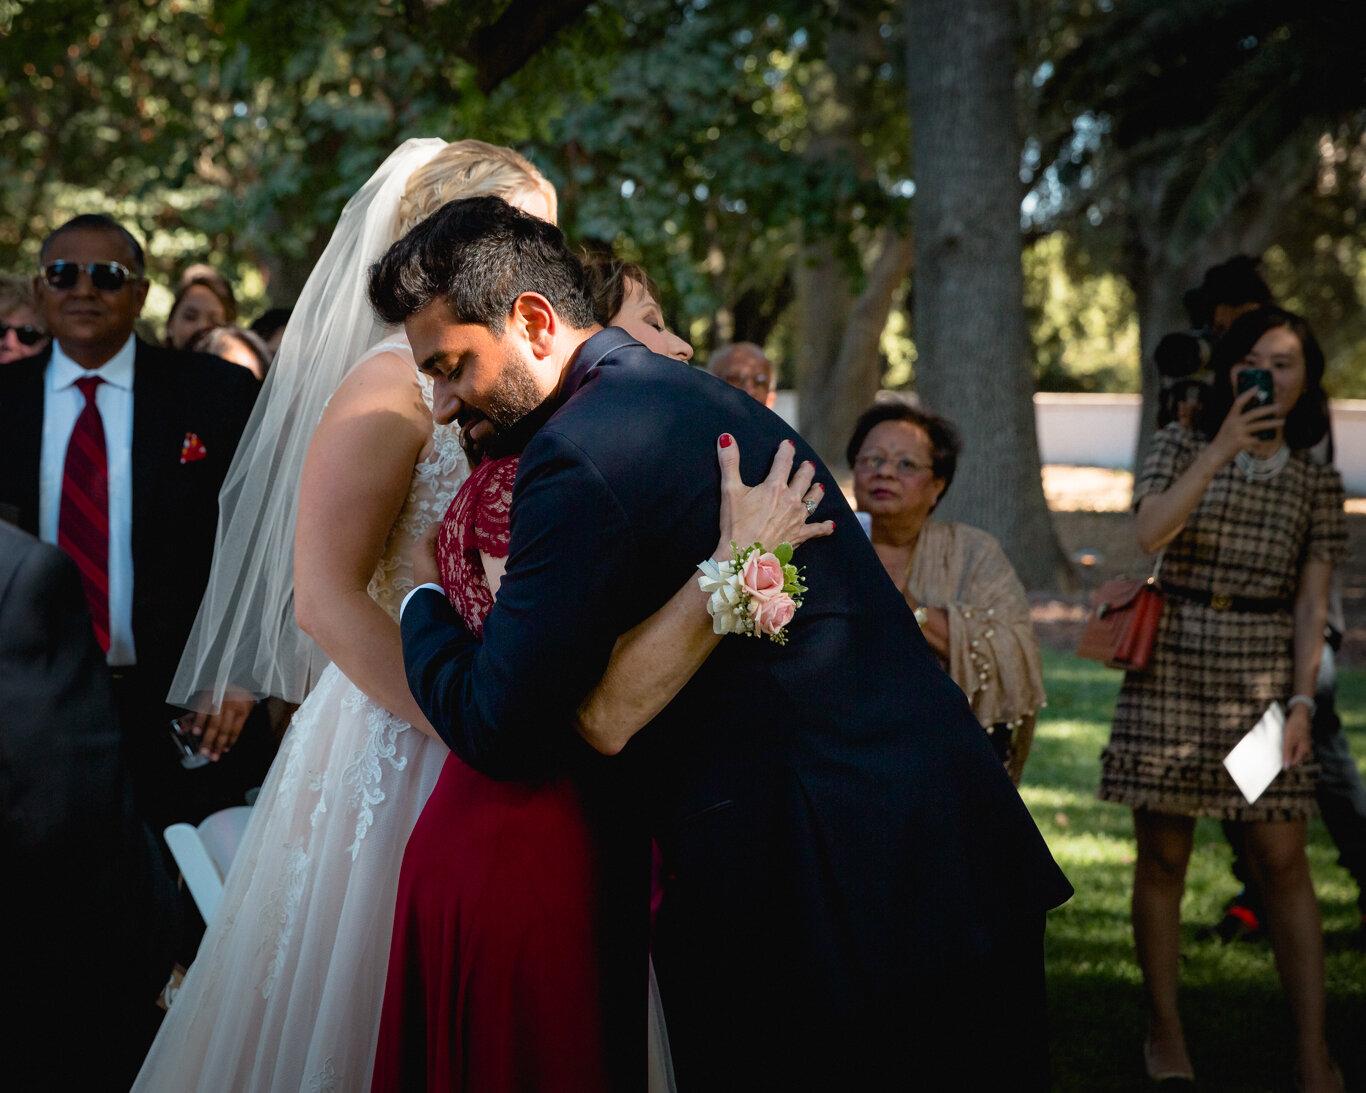 2019.08.24_Emily-Ashir-Wedding-at-the-Maples-5760.jpg